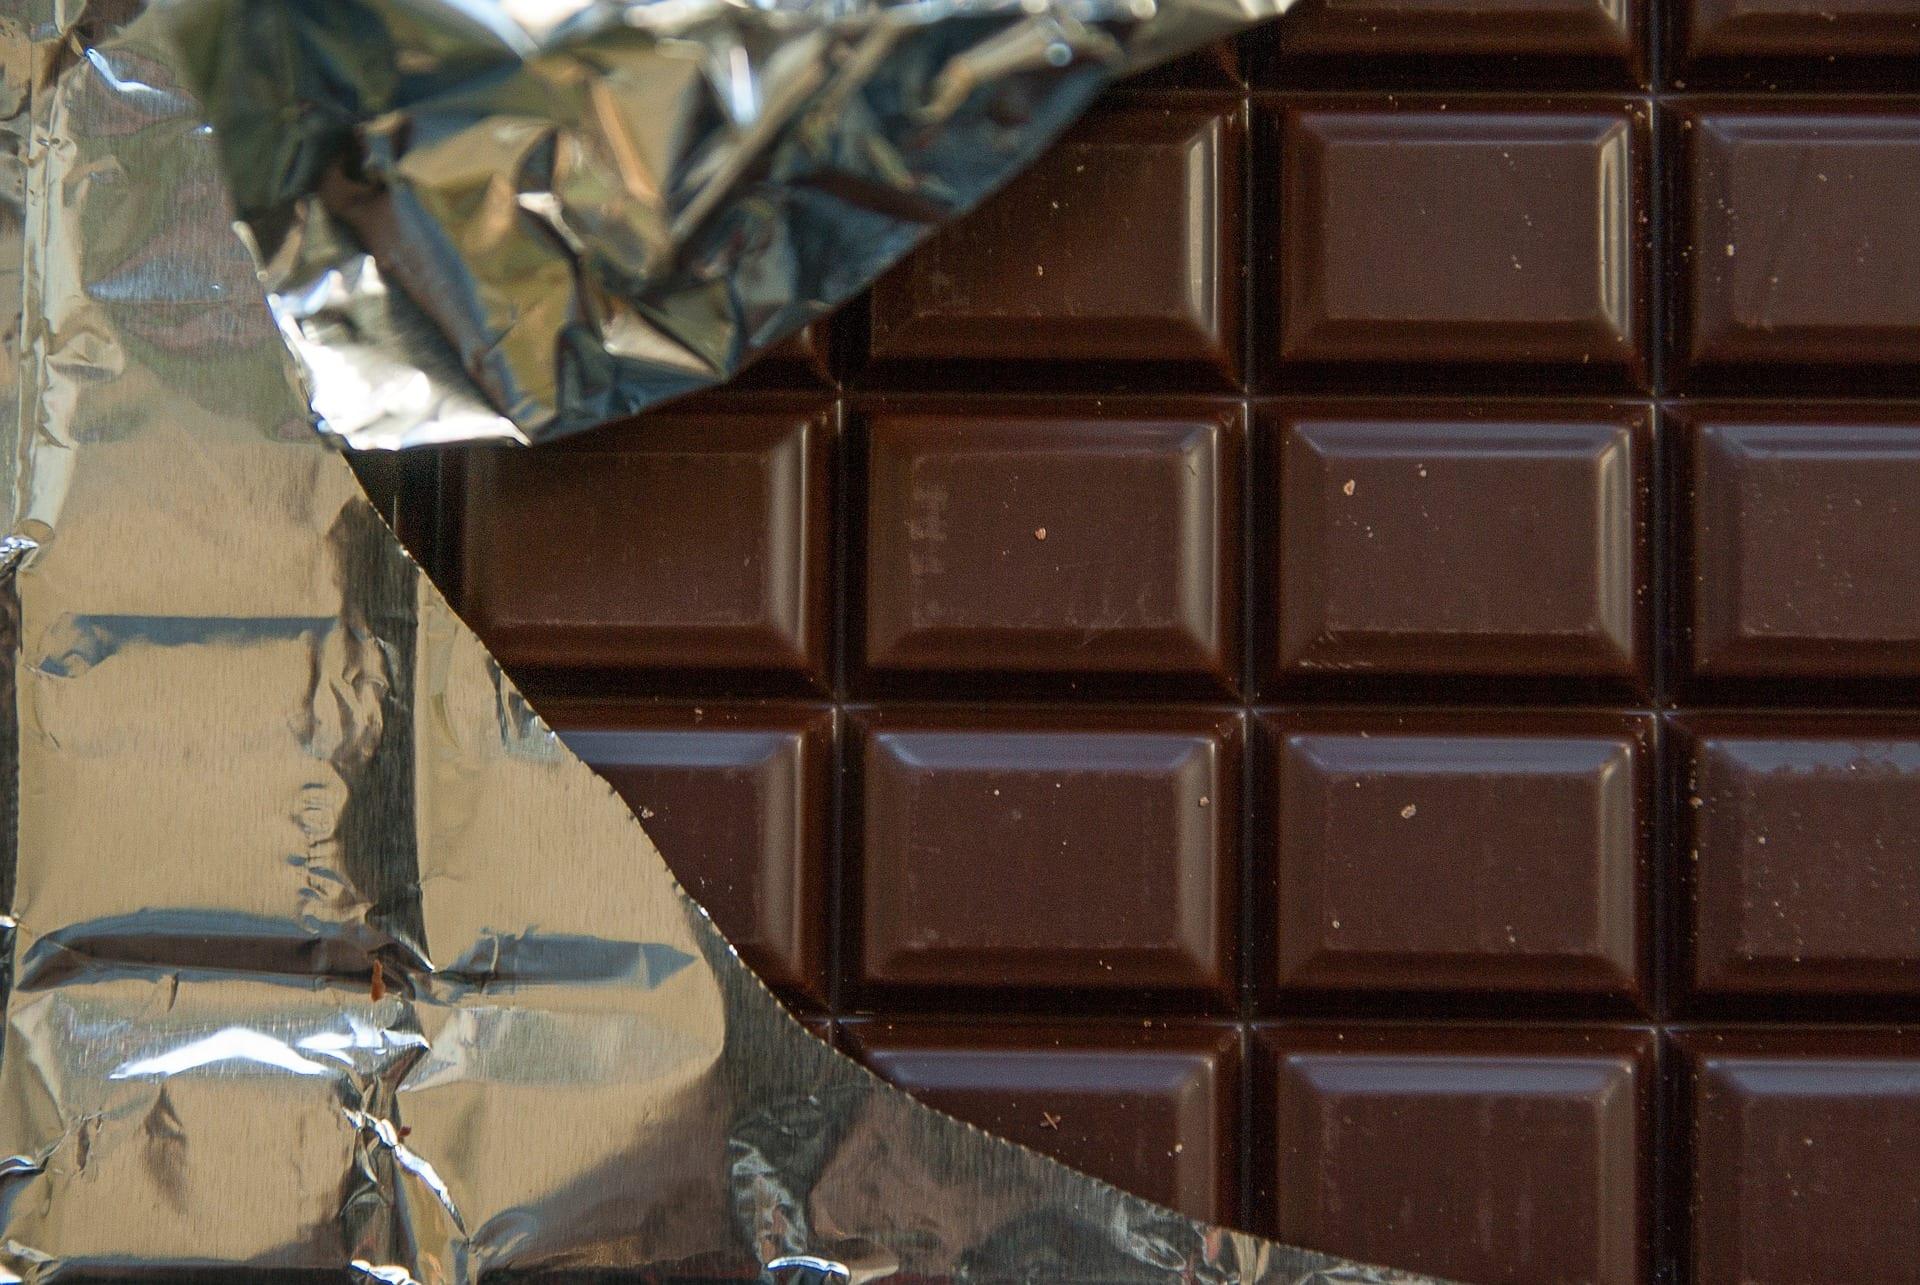 Dark chocolate bar